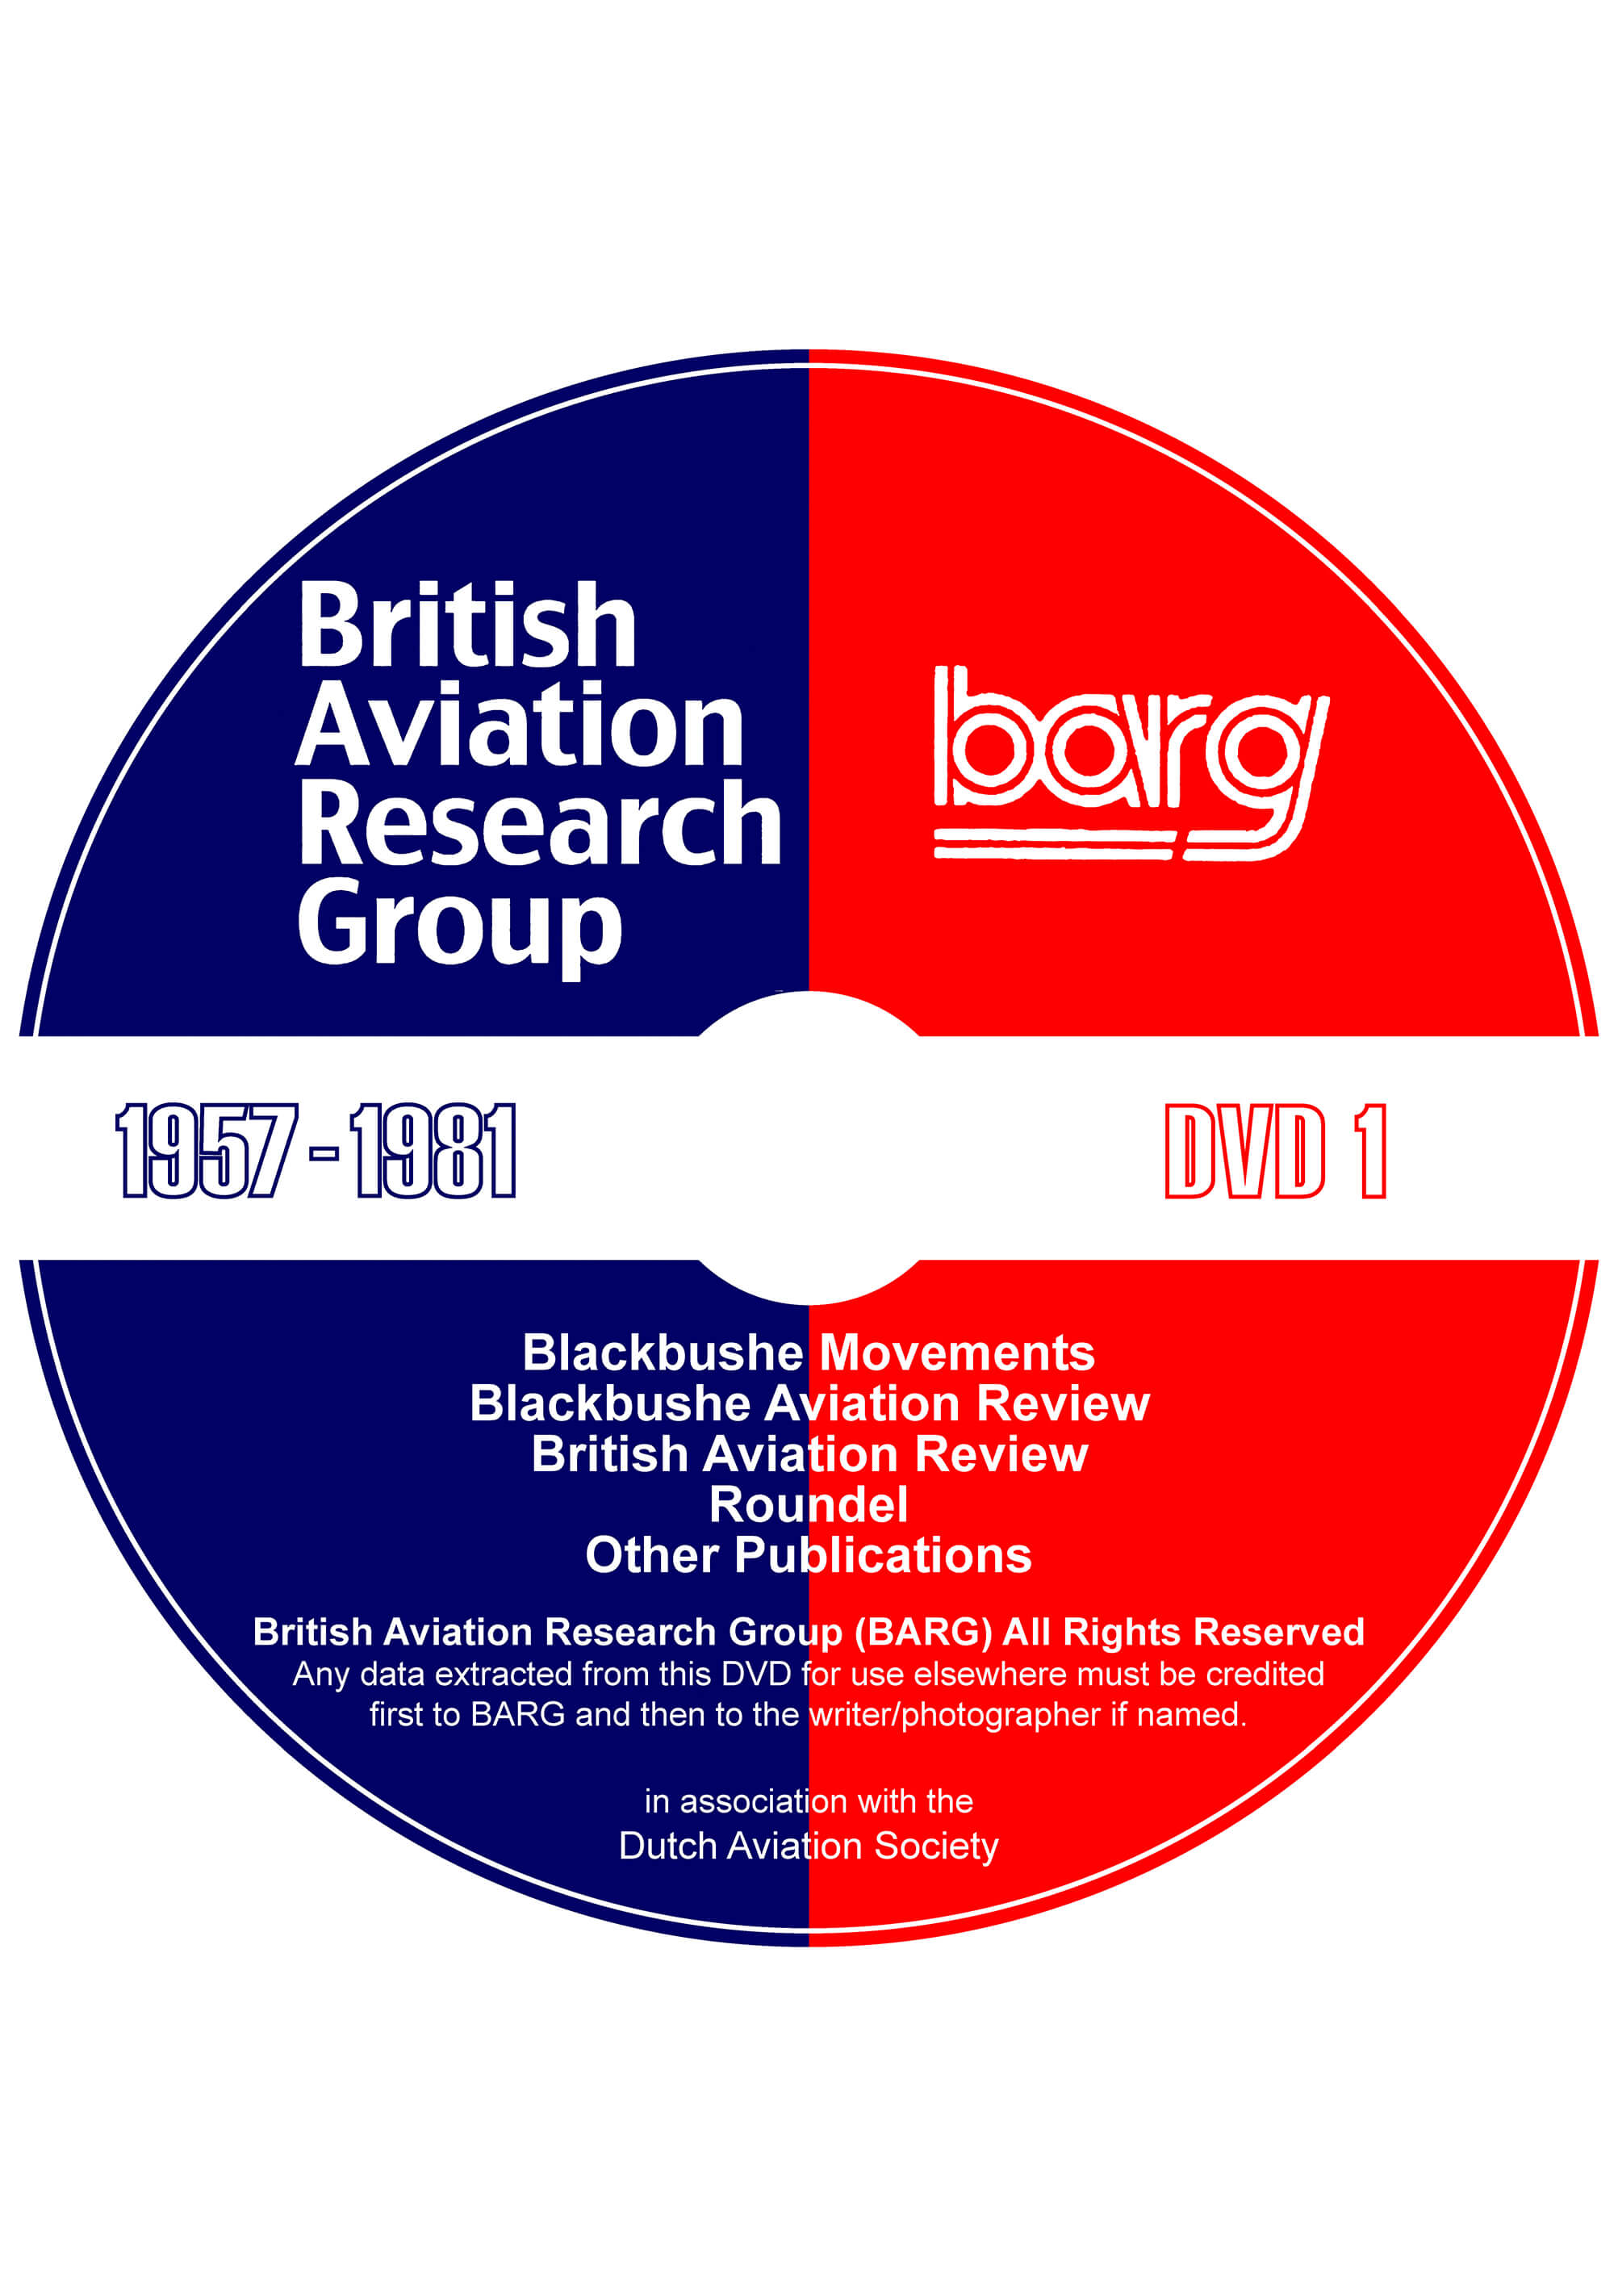 BARG DVD 1 (1957-1981)